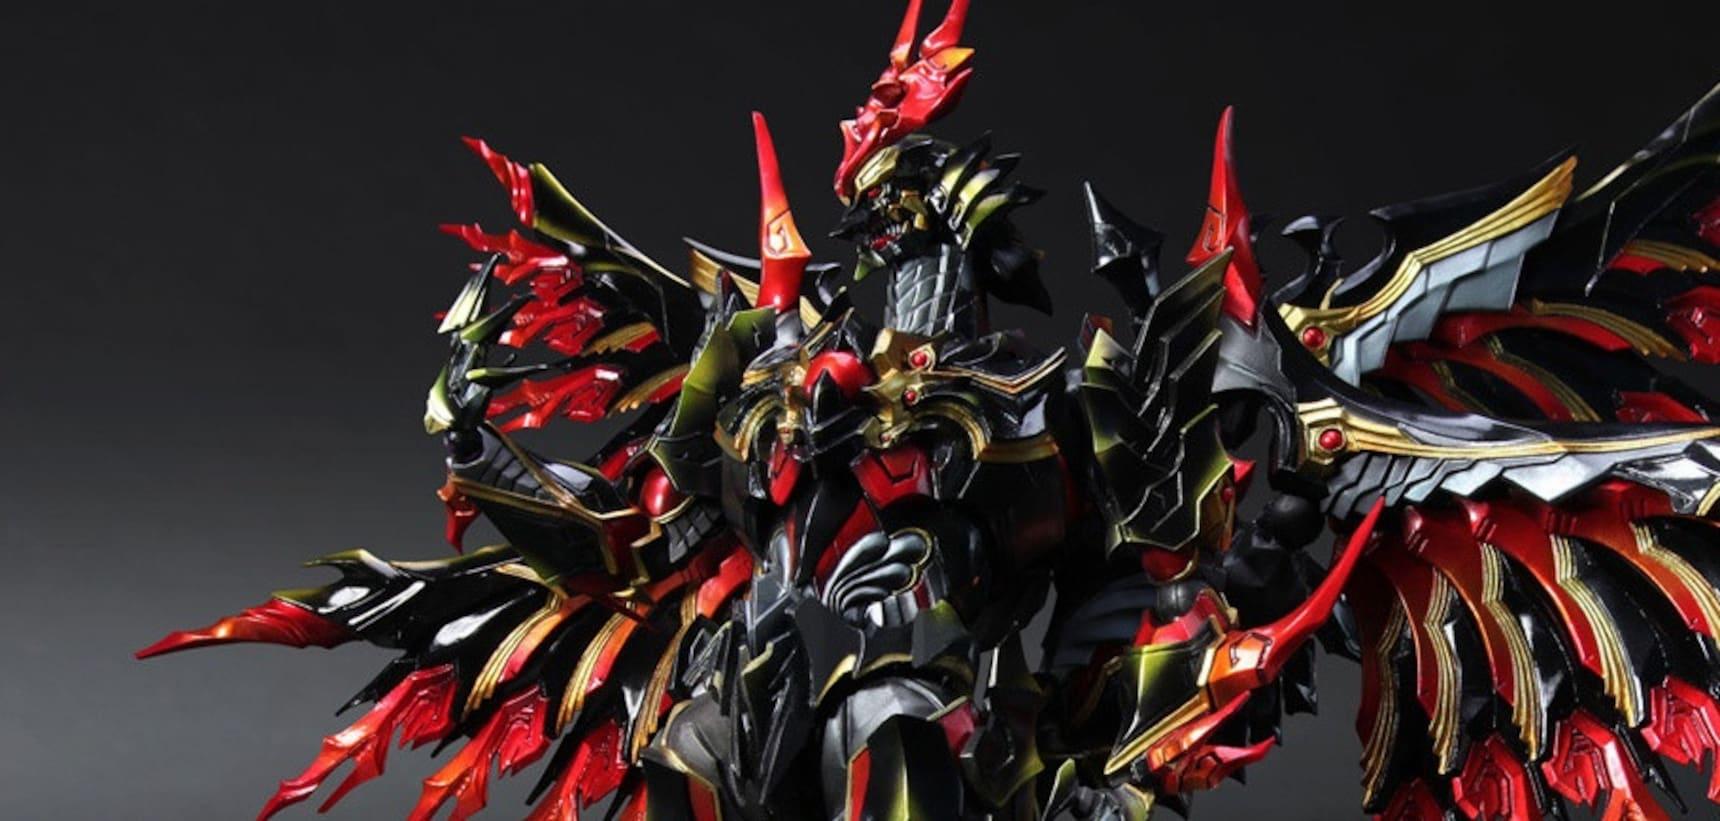 Top 10 Coolest Toys at Tokyo Otaku Mode